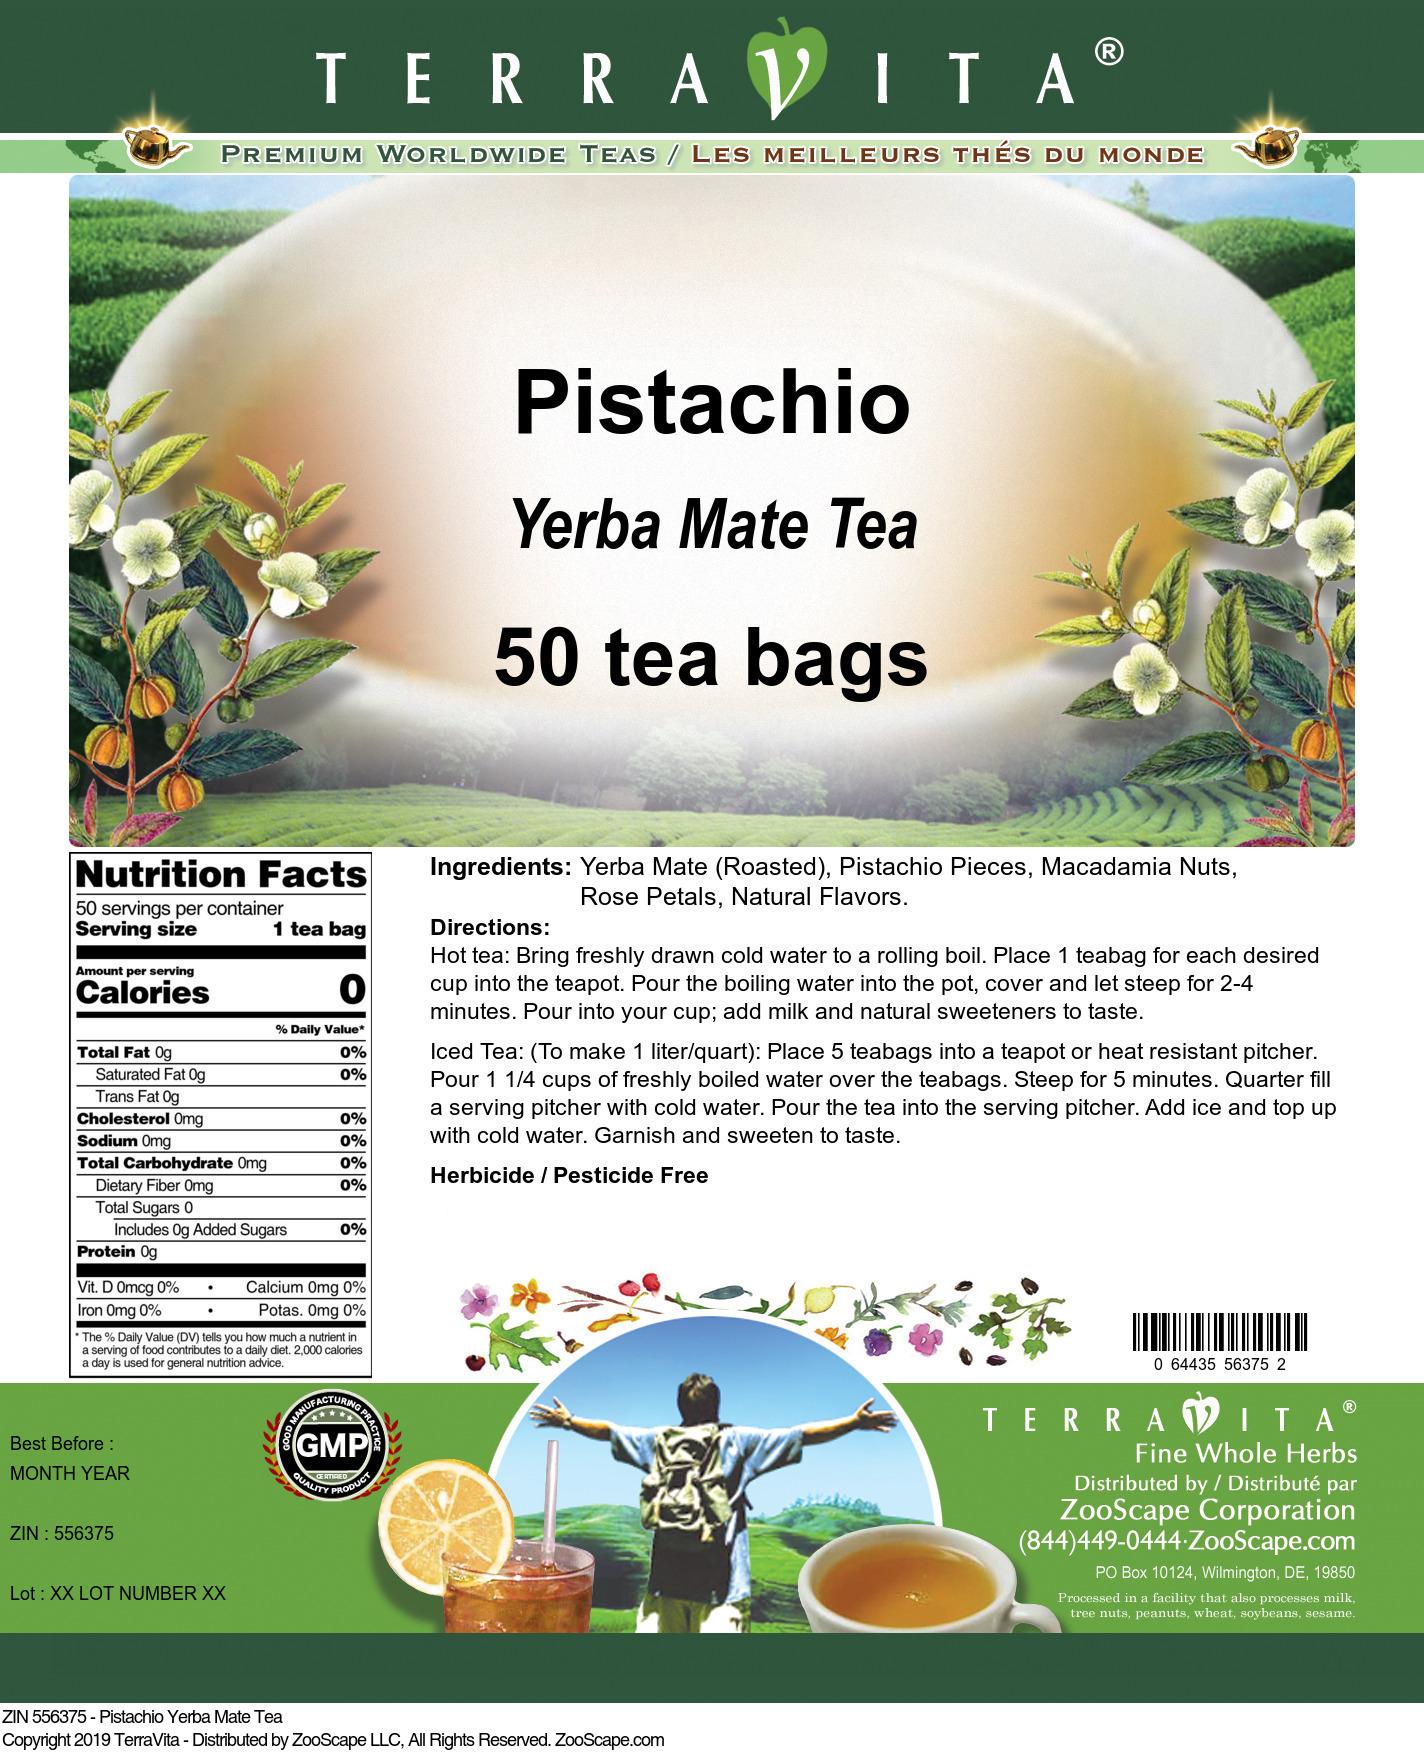 Pistachio Yerba Mate Tea